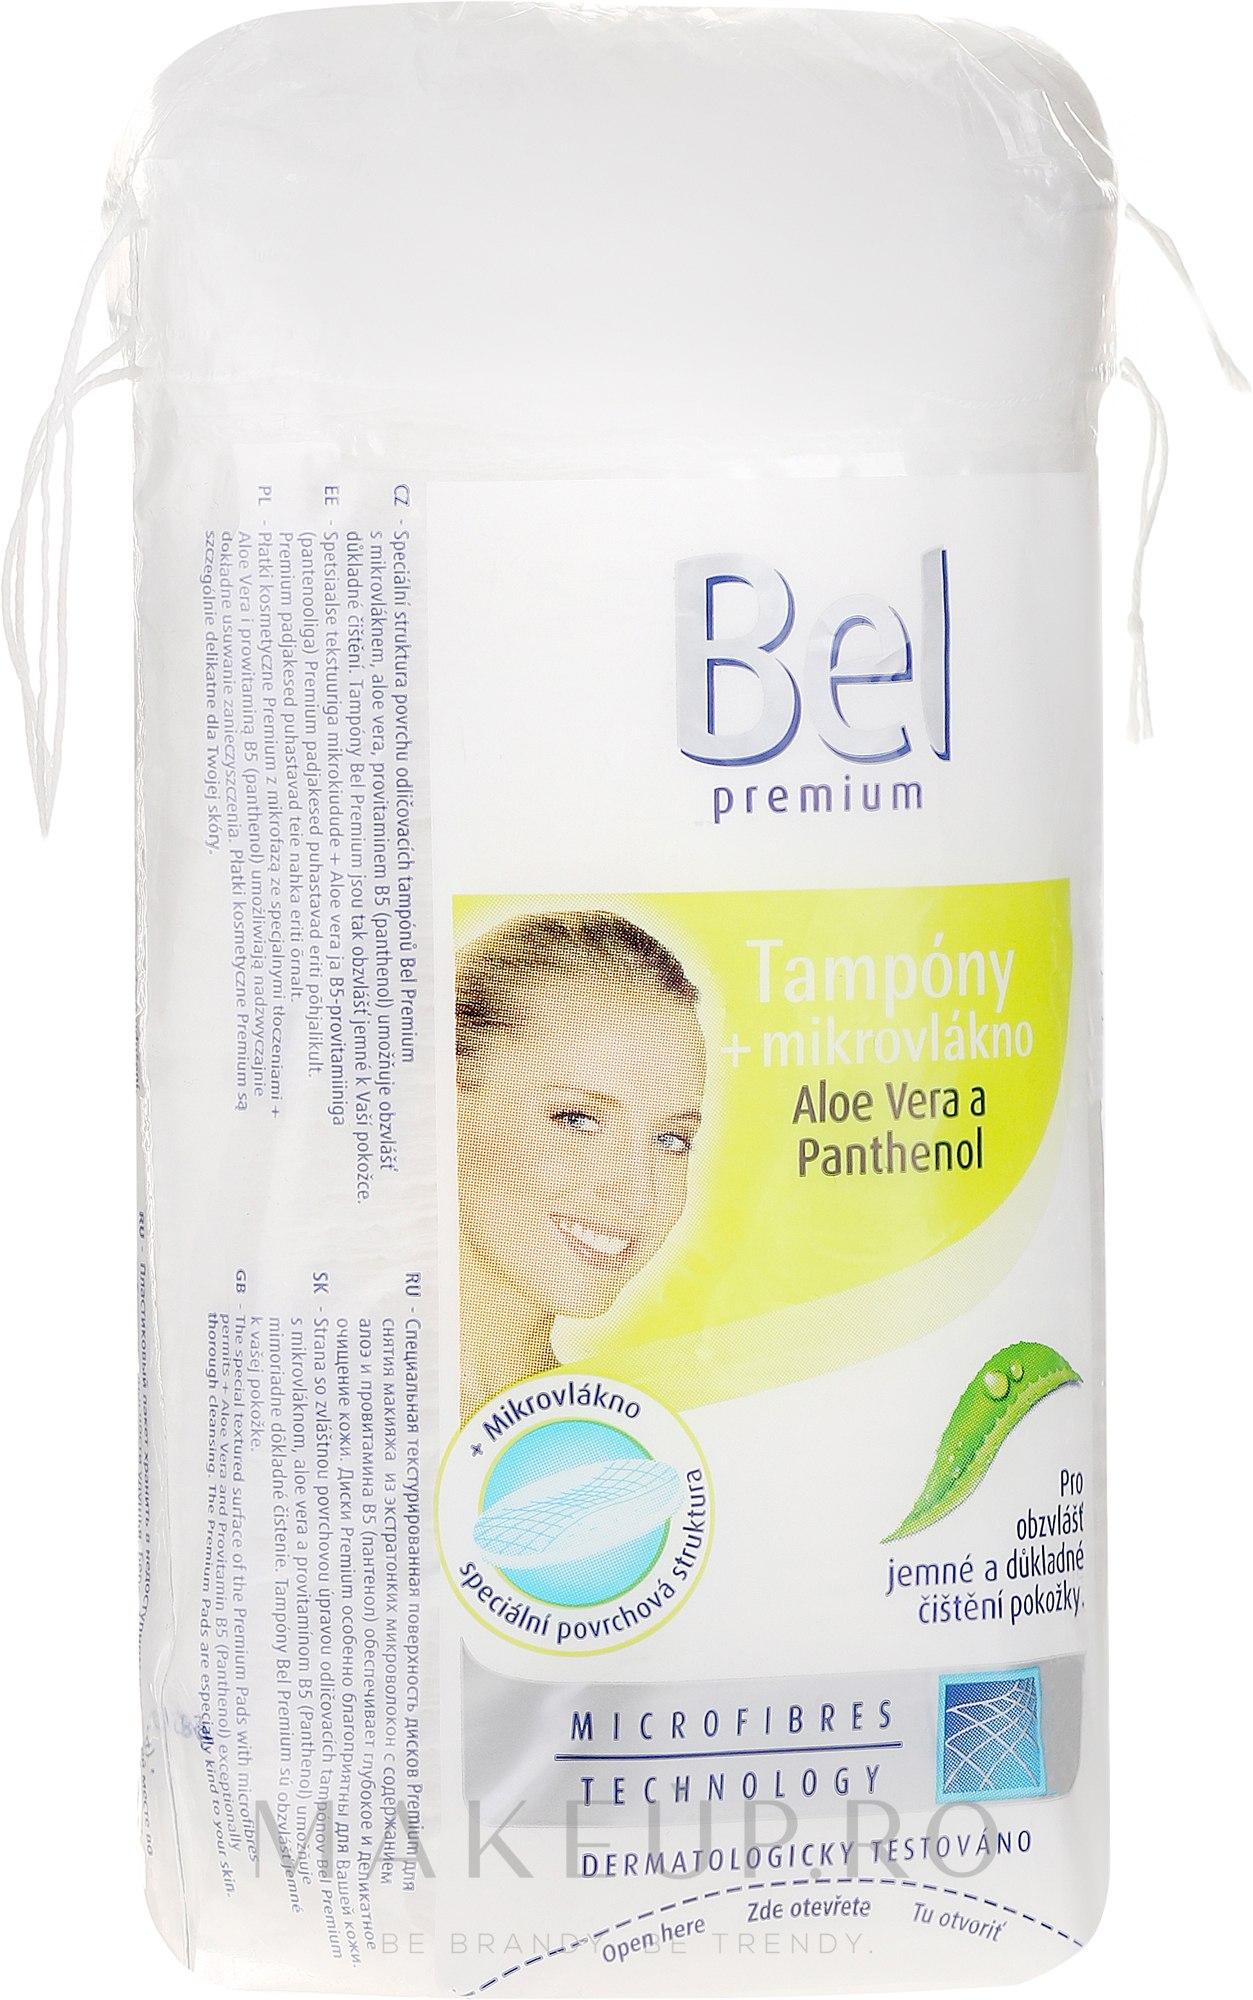 Discuri din bumbac - Bel Premium Oval Pads with Aloe Vera — Imagine 45 buc